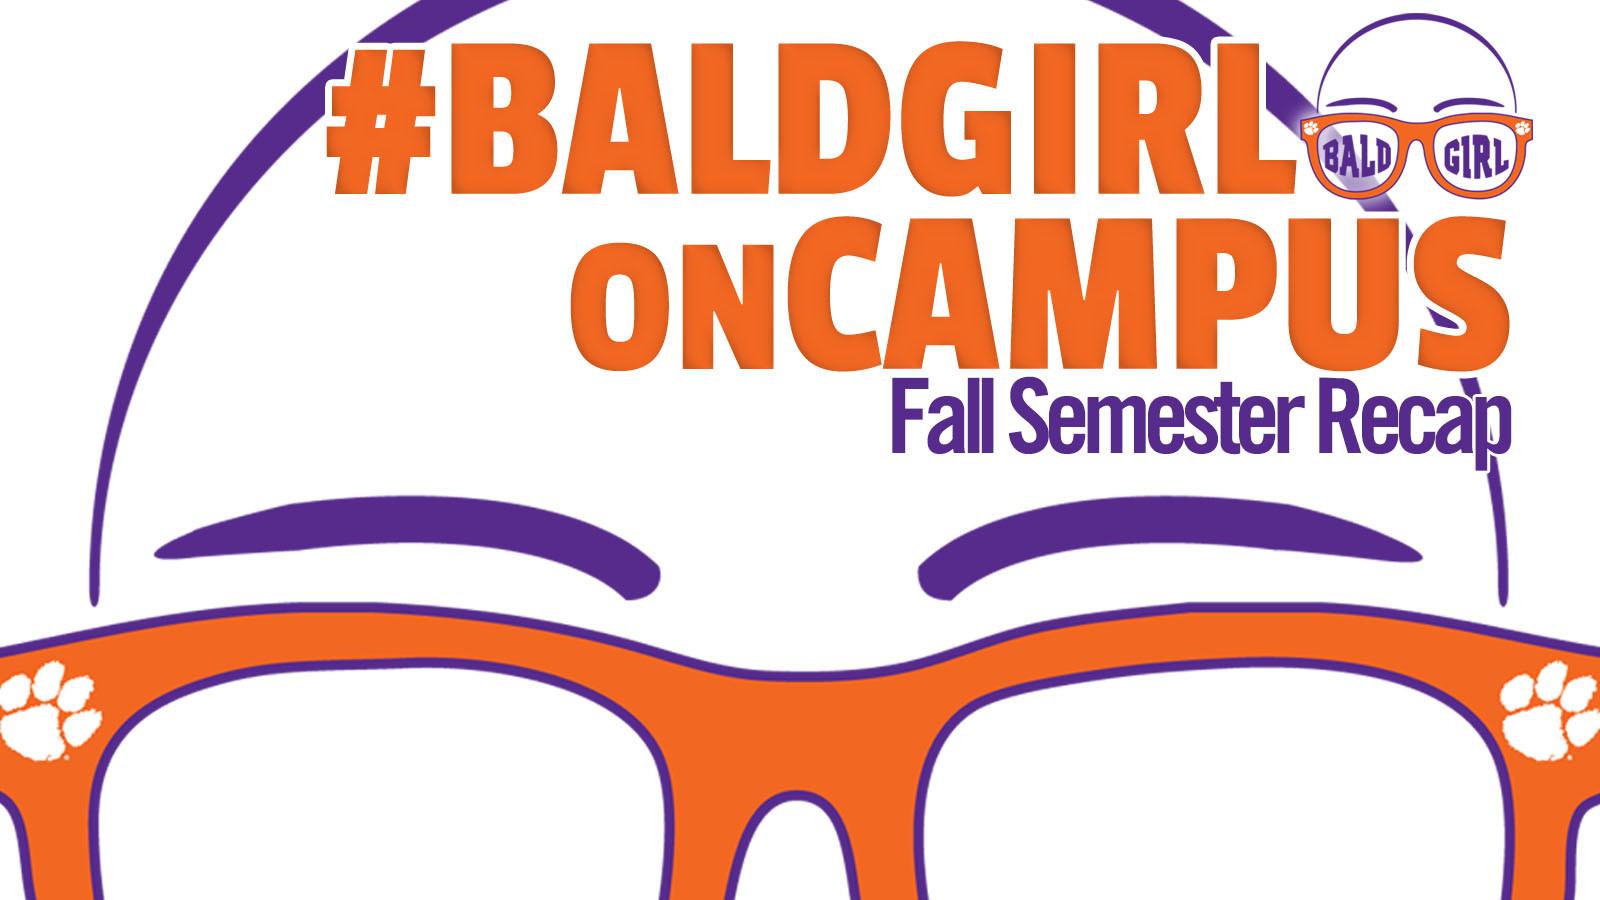 ClemsonTigers.com's Bald Girl on Campus: Fall 2013 Recap